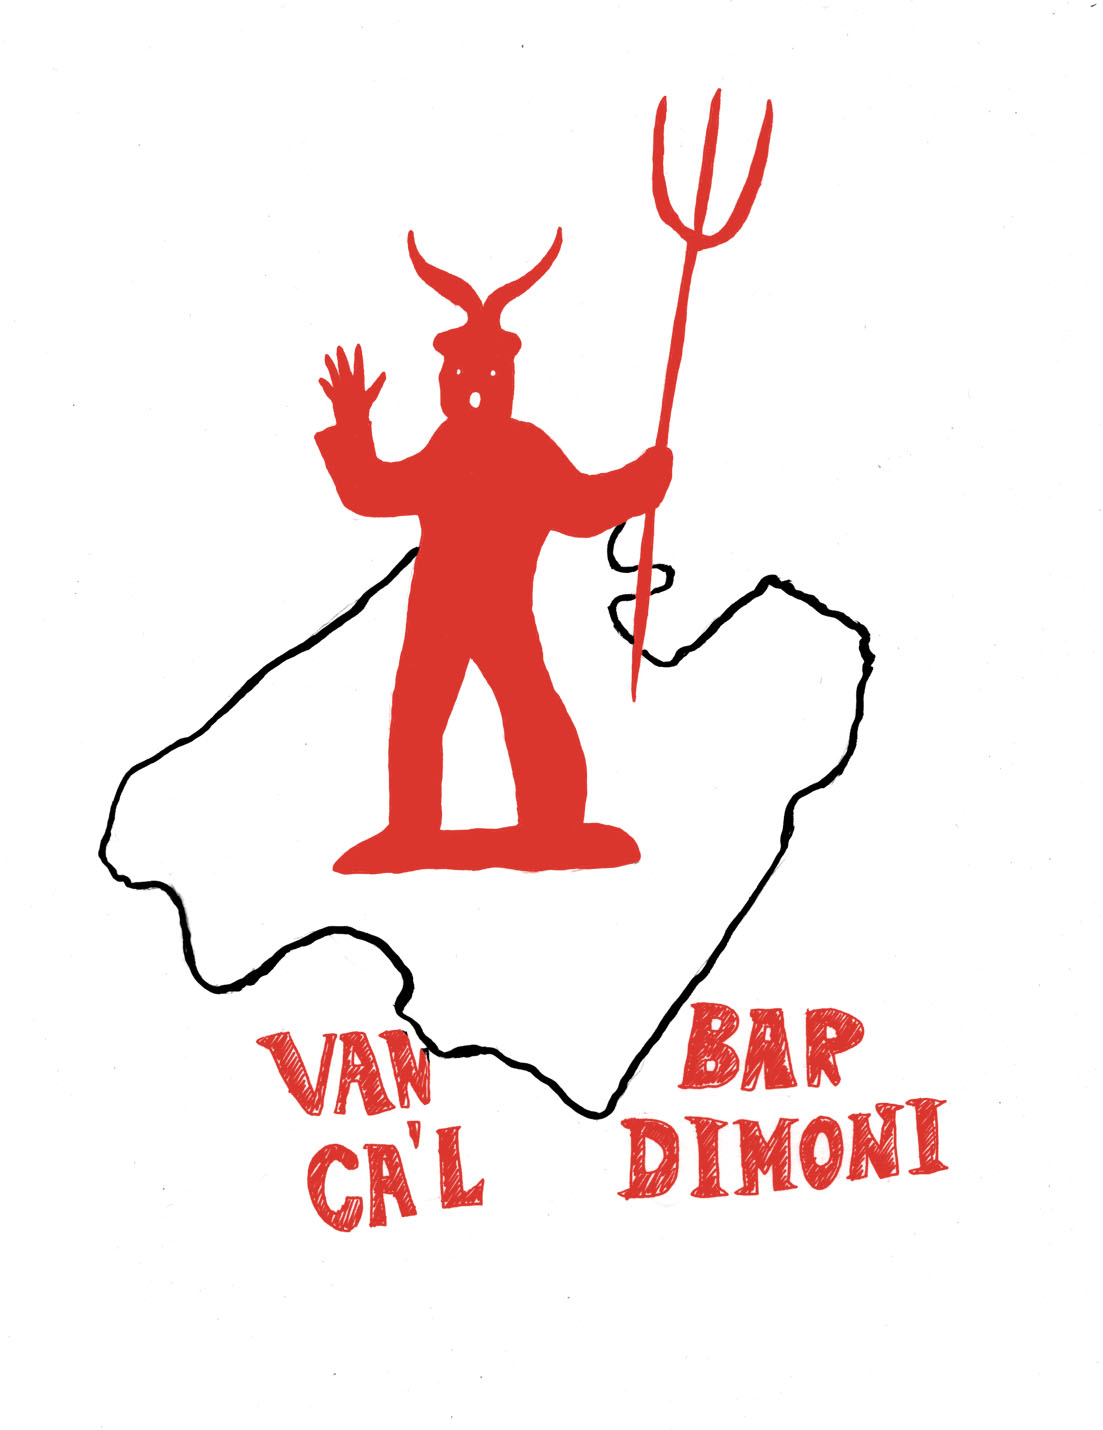 Cal Dimoni